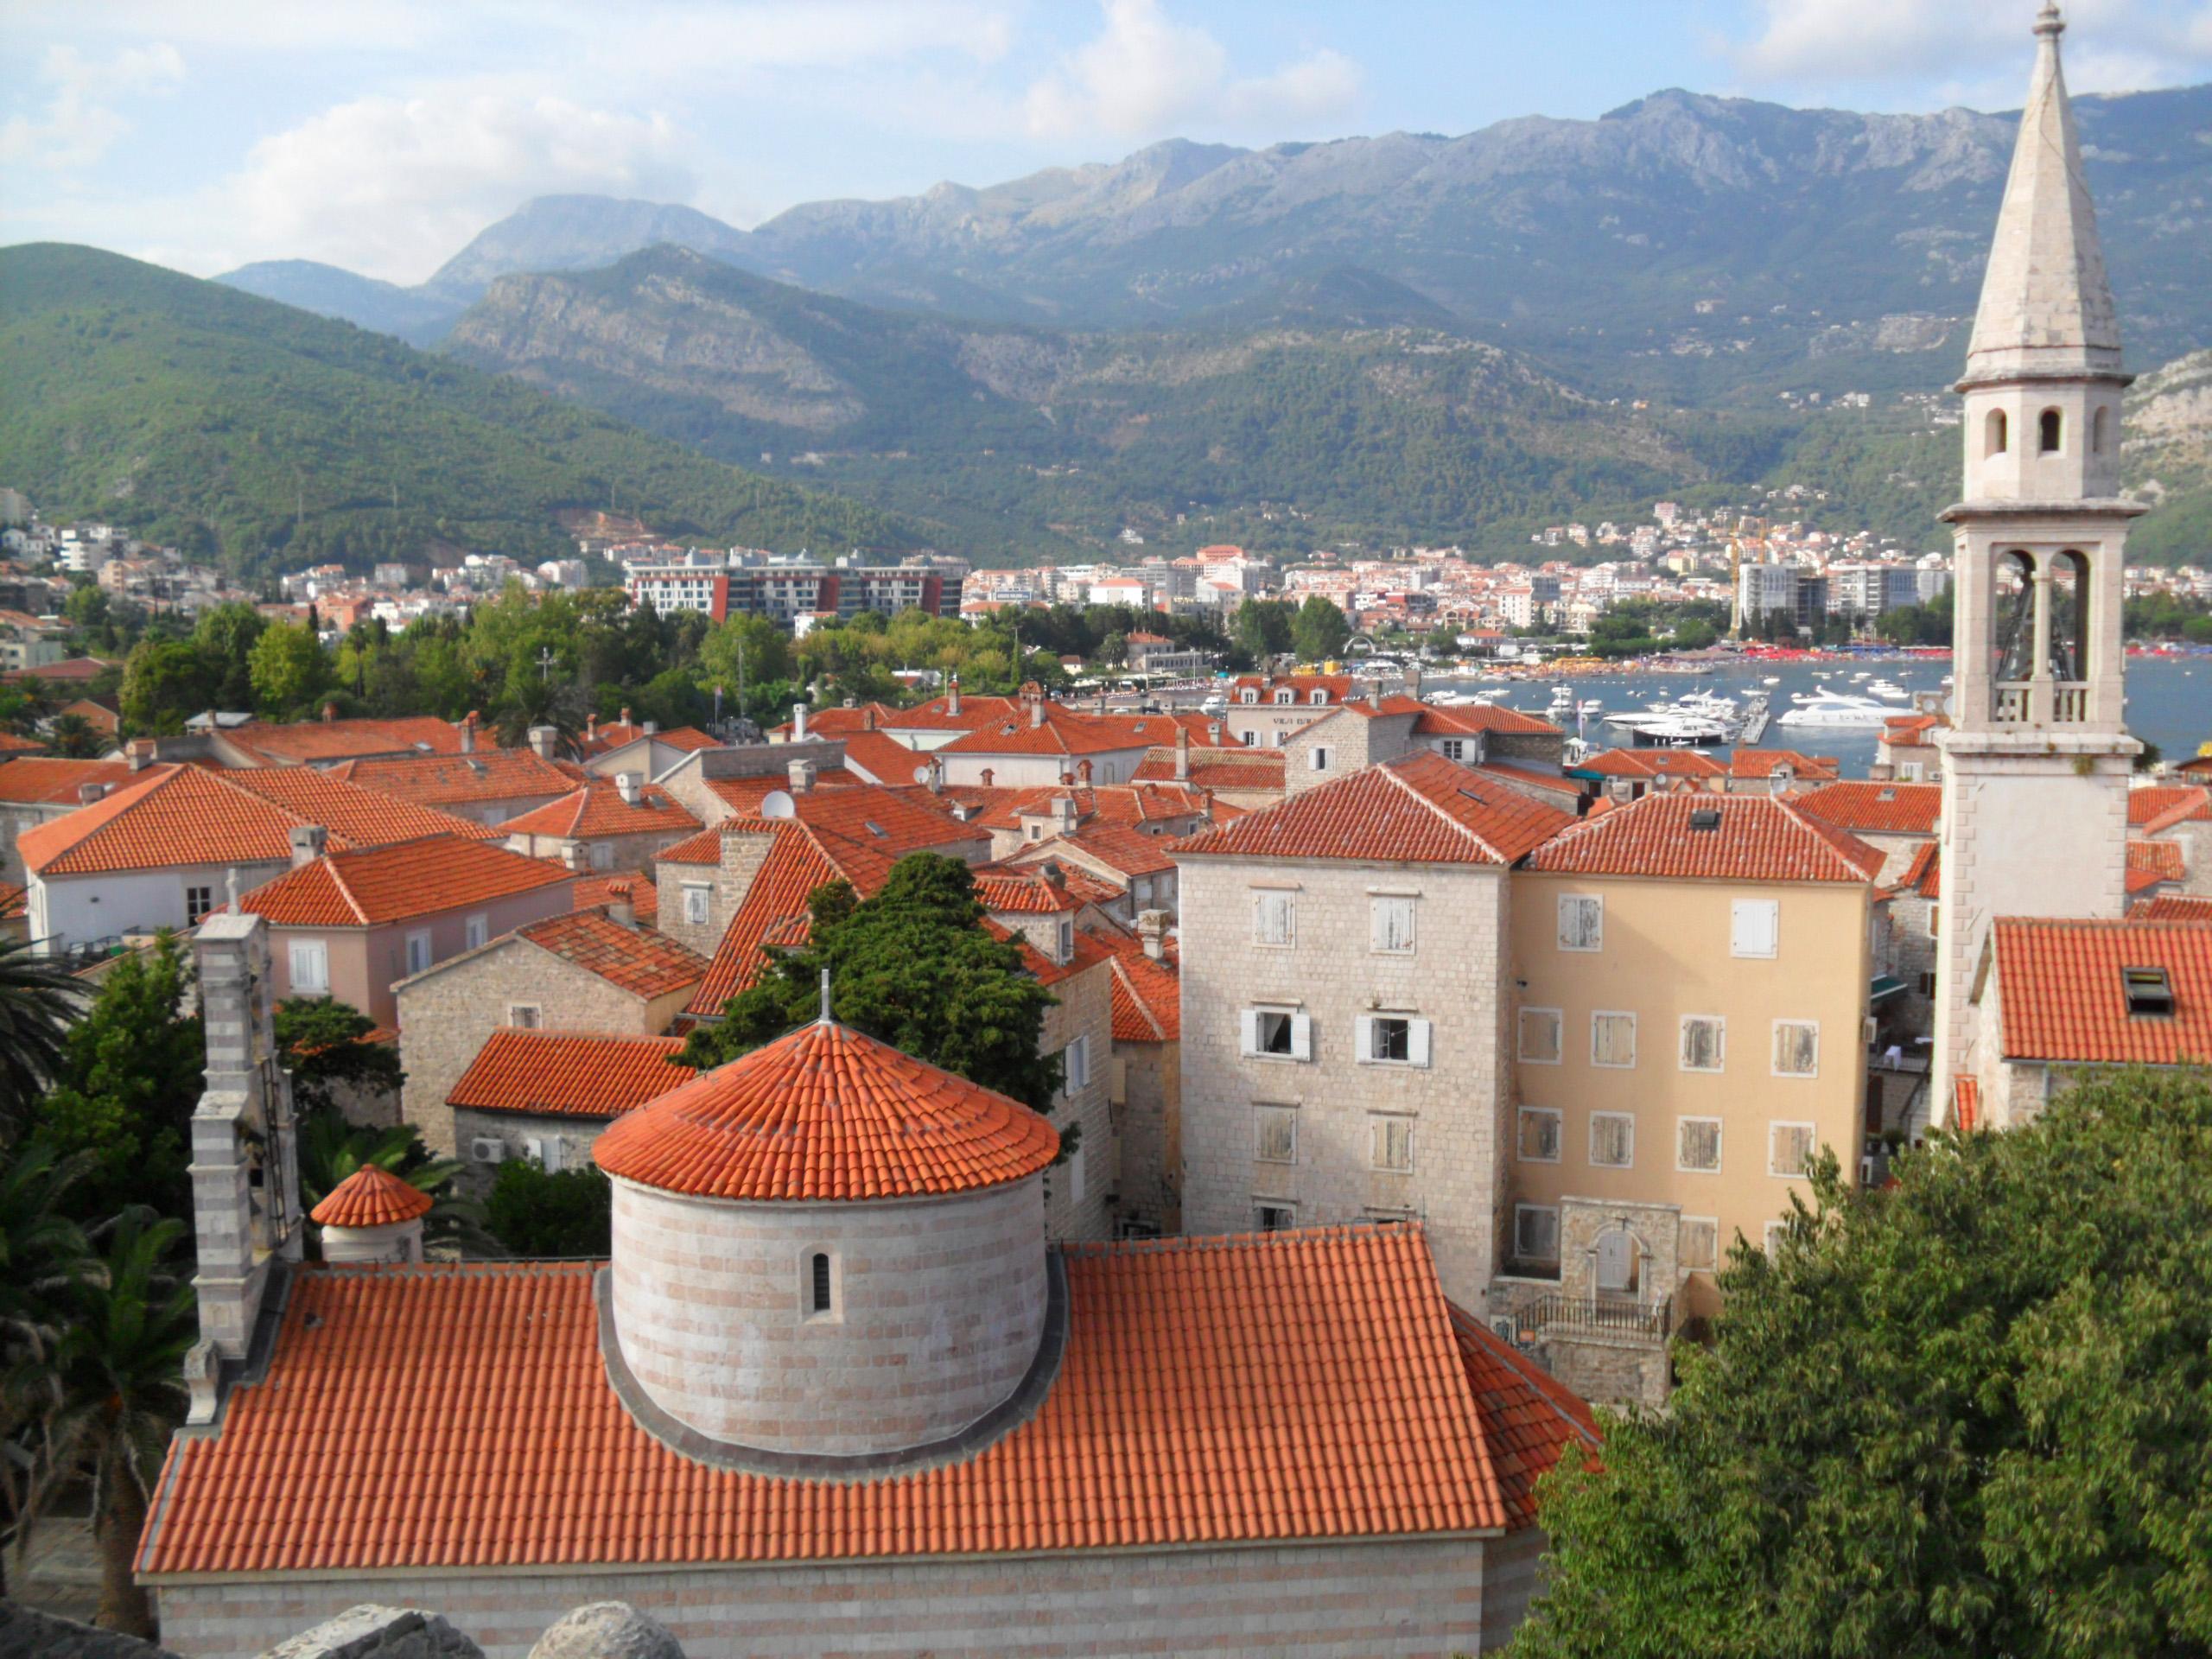 hoteluri budva, hotele budva, odihna montenegro, odihna muntenegru, agentie de turms chisinau, oferte odihna la mare ieftin